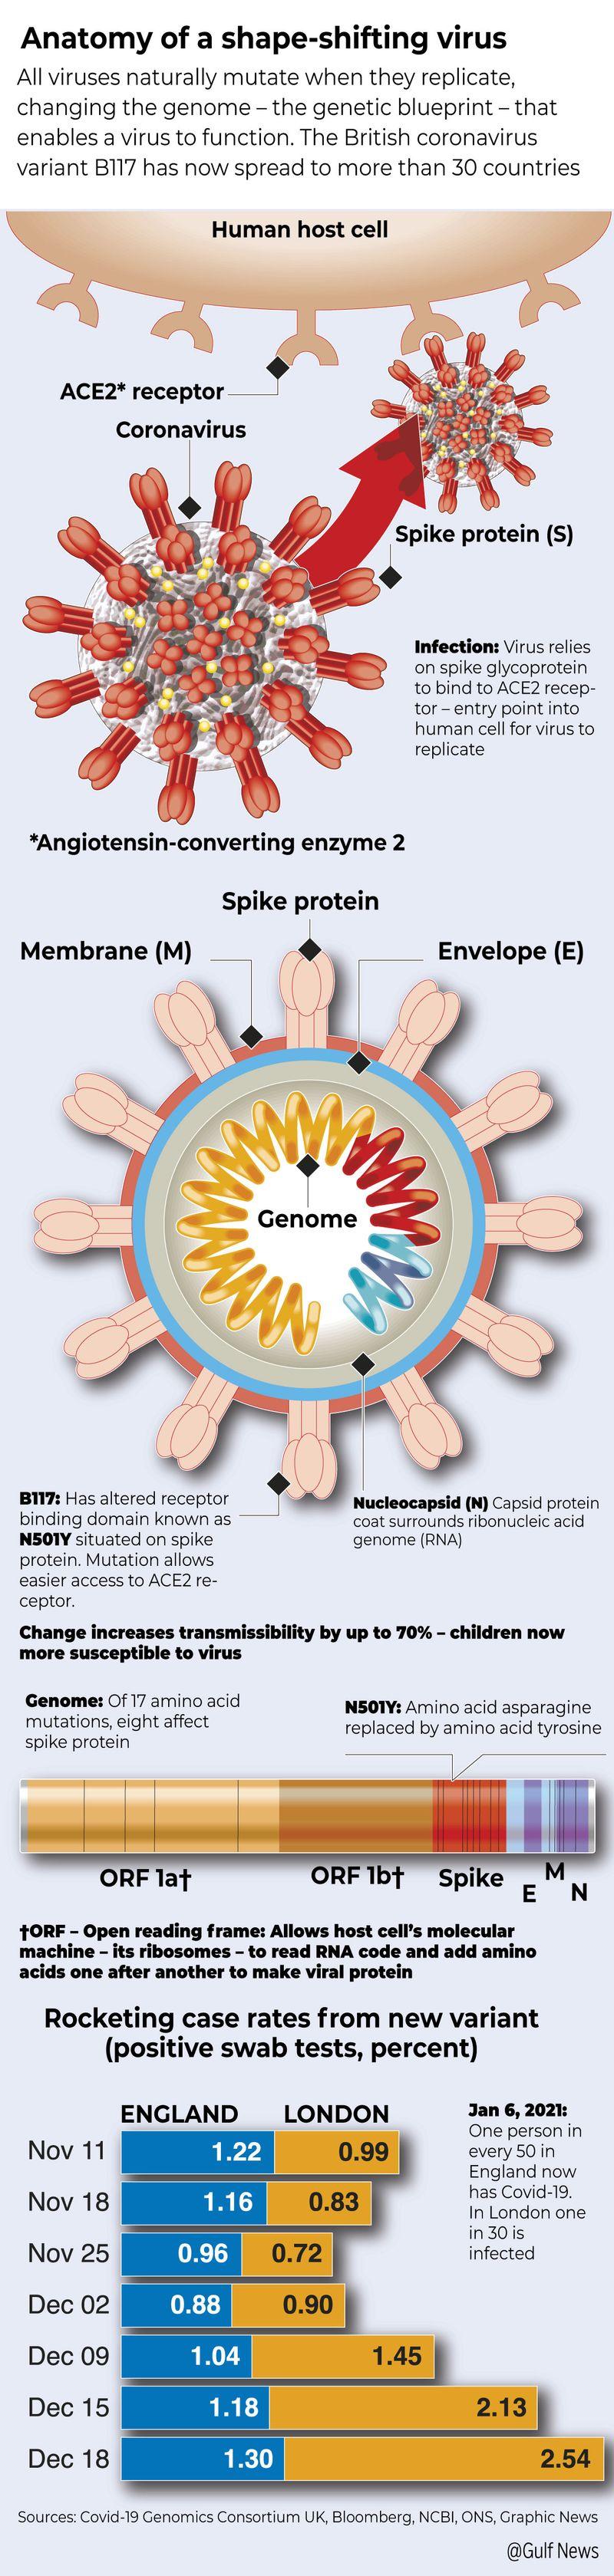 Anatomy of a shapeshifting virus